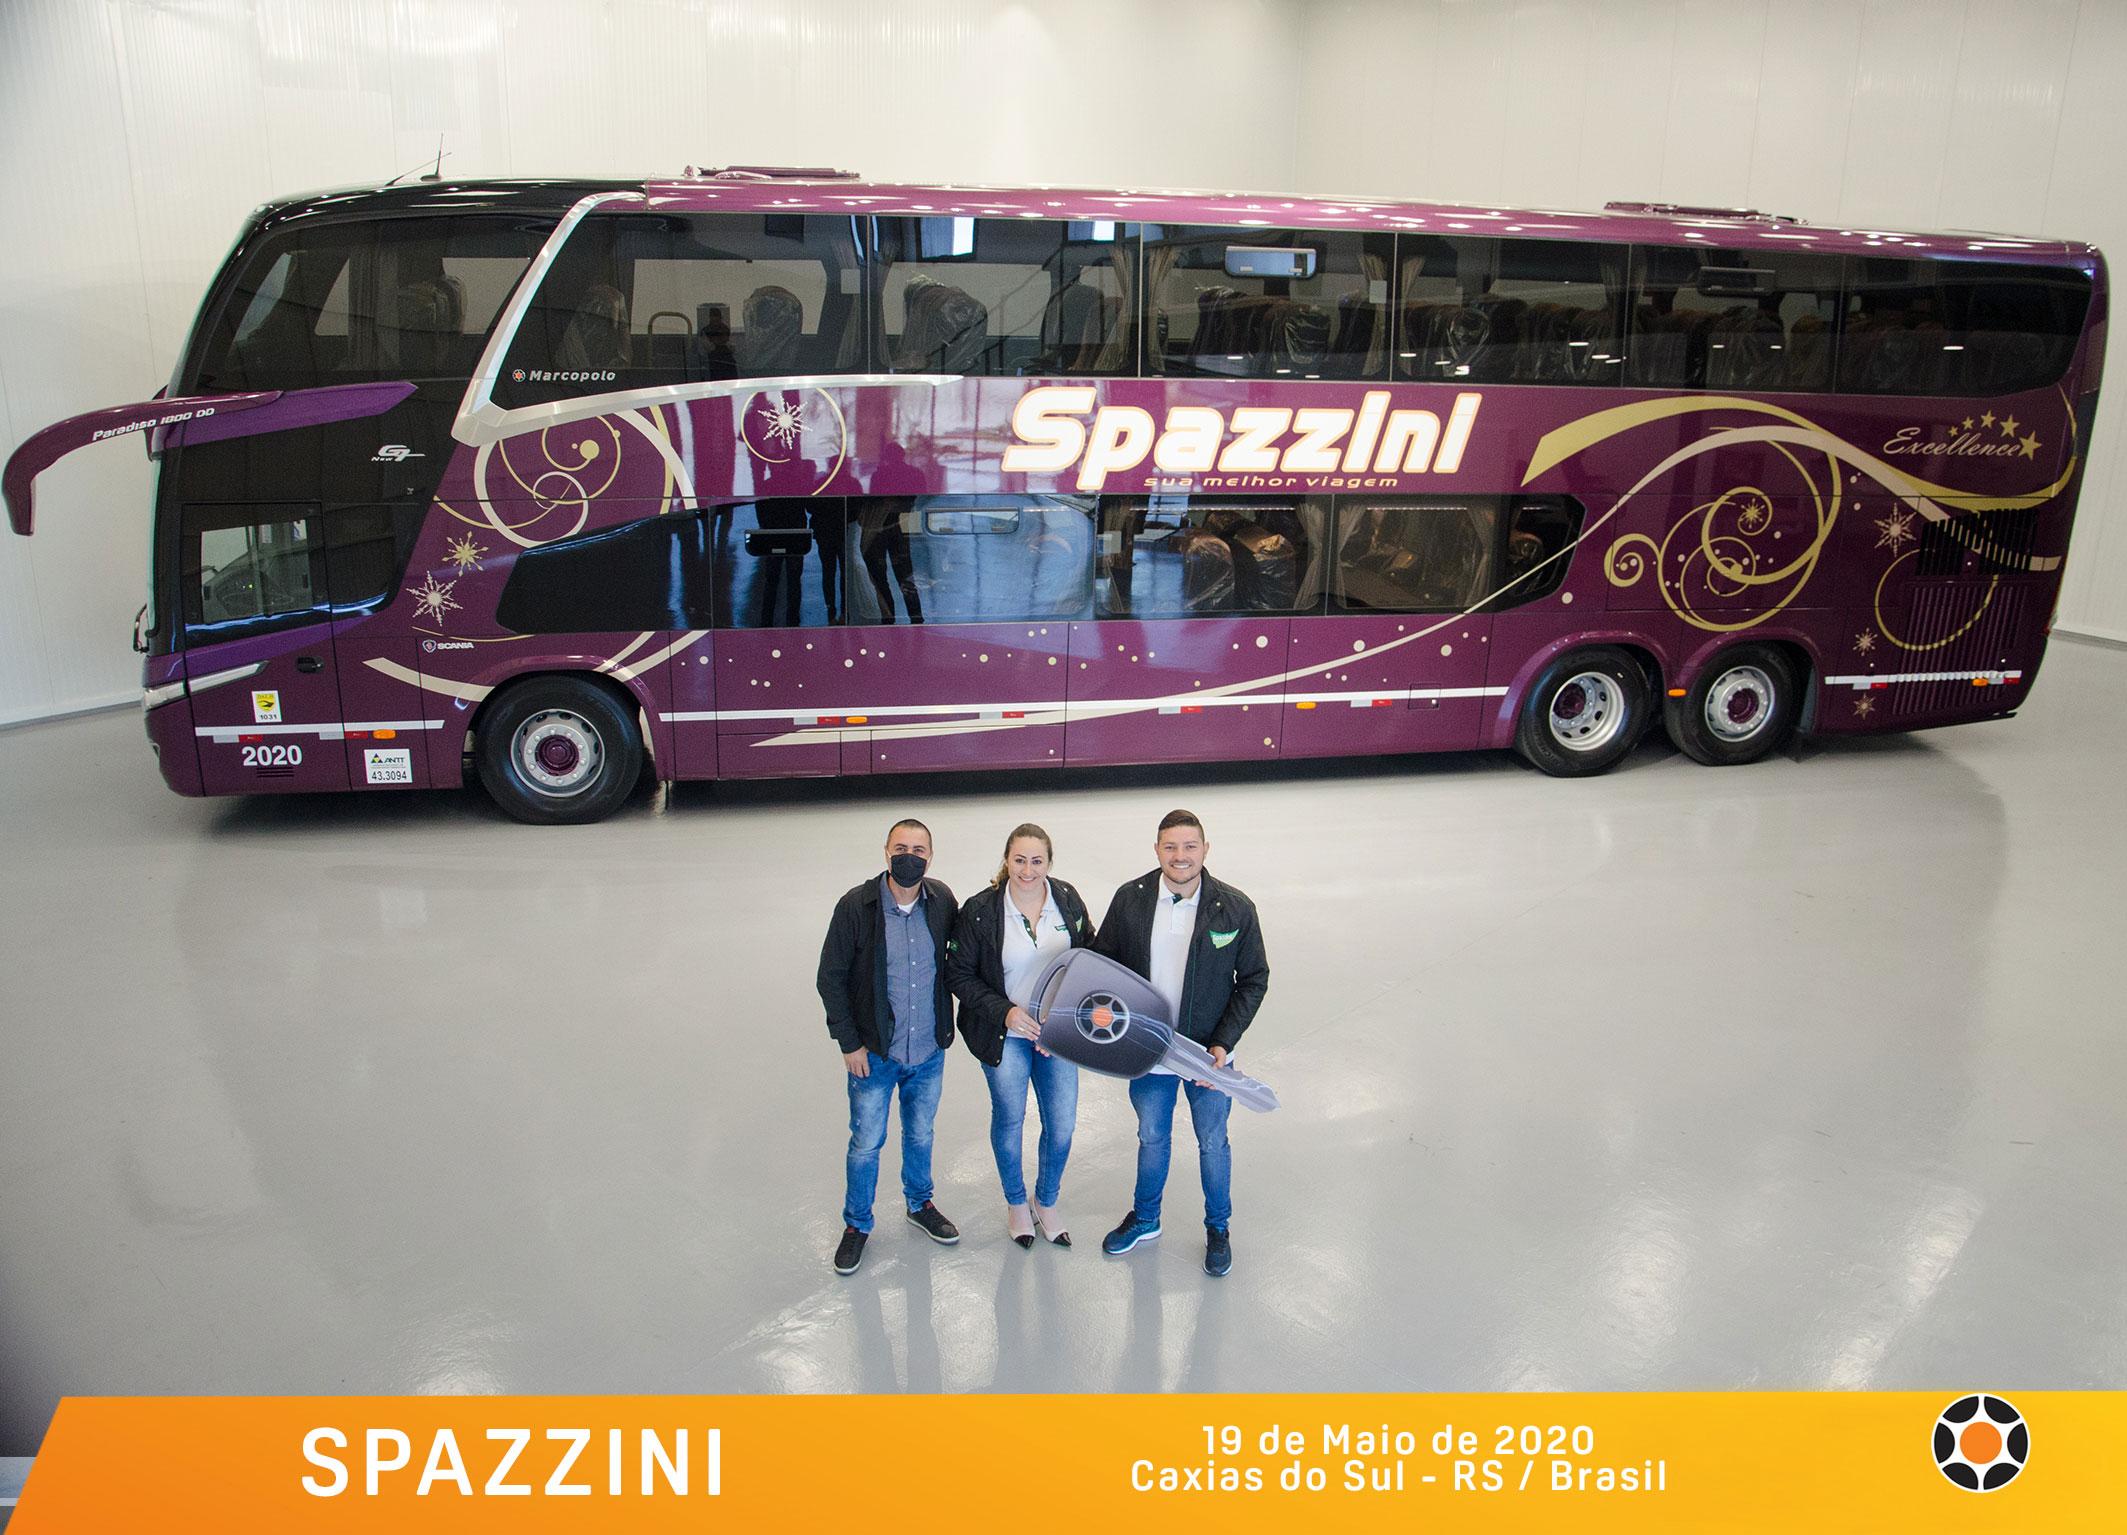 Spazzini